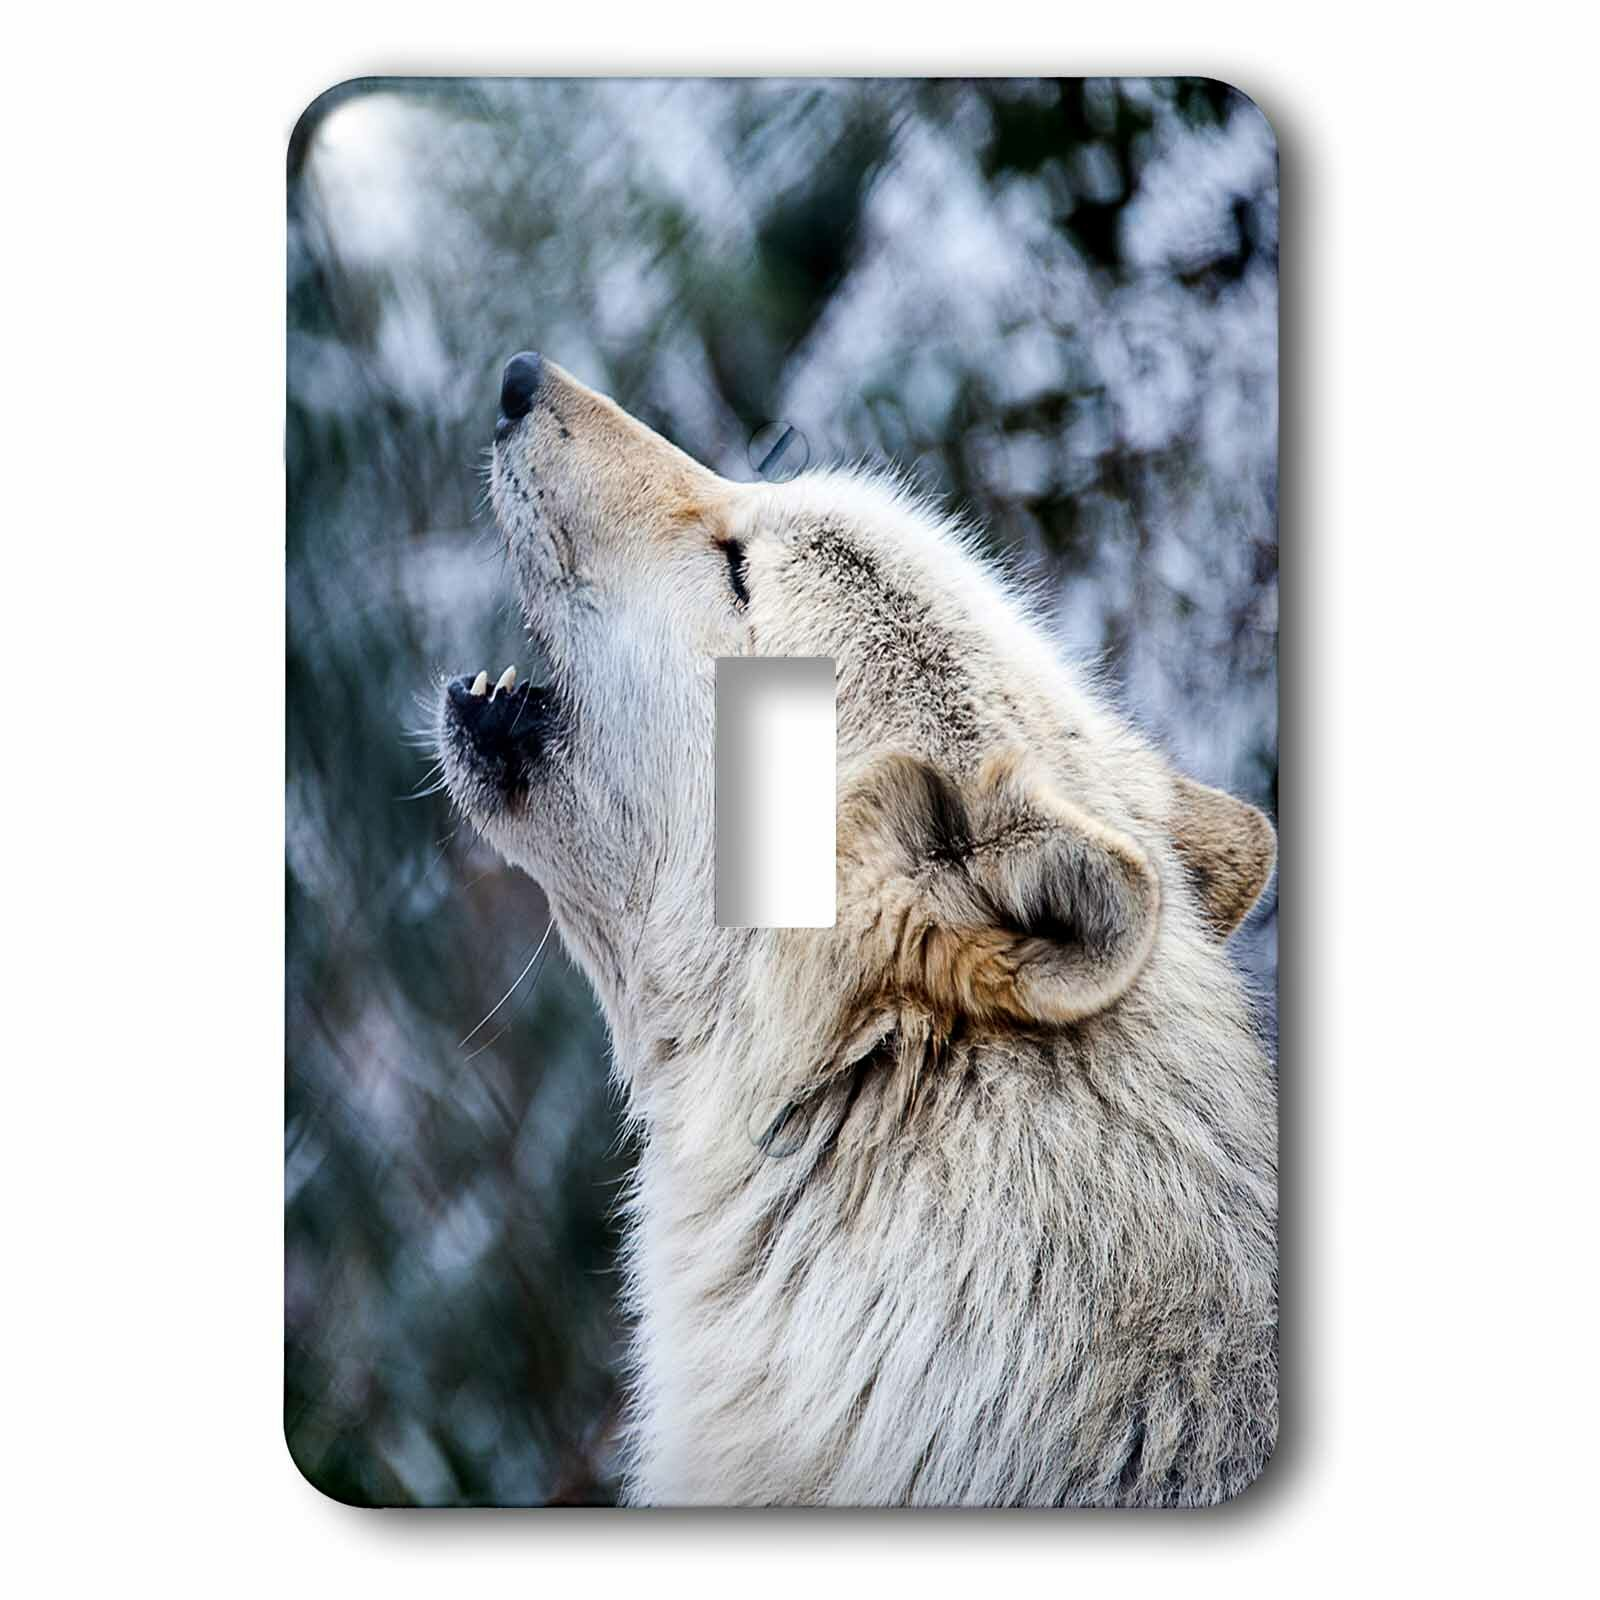 3drose Wolf Howling 1 Gang Toggle Light Switch Wall Plate Wayfair